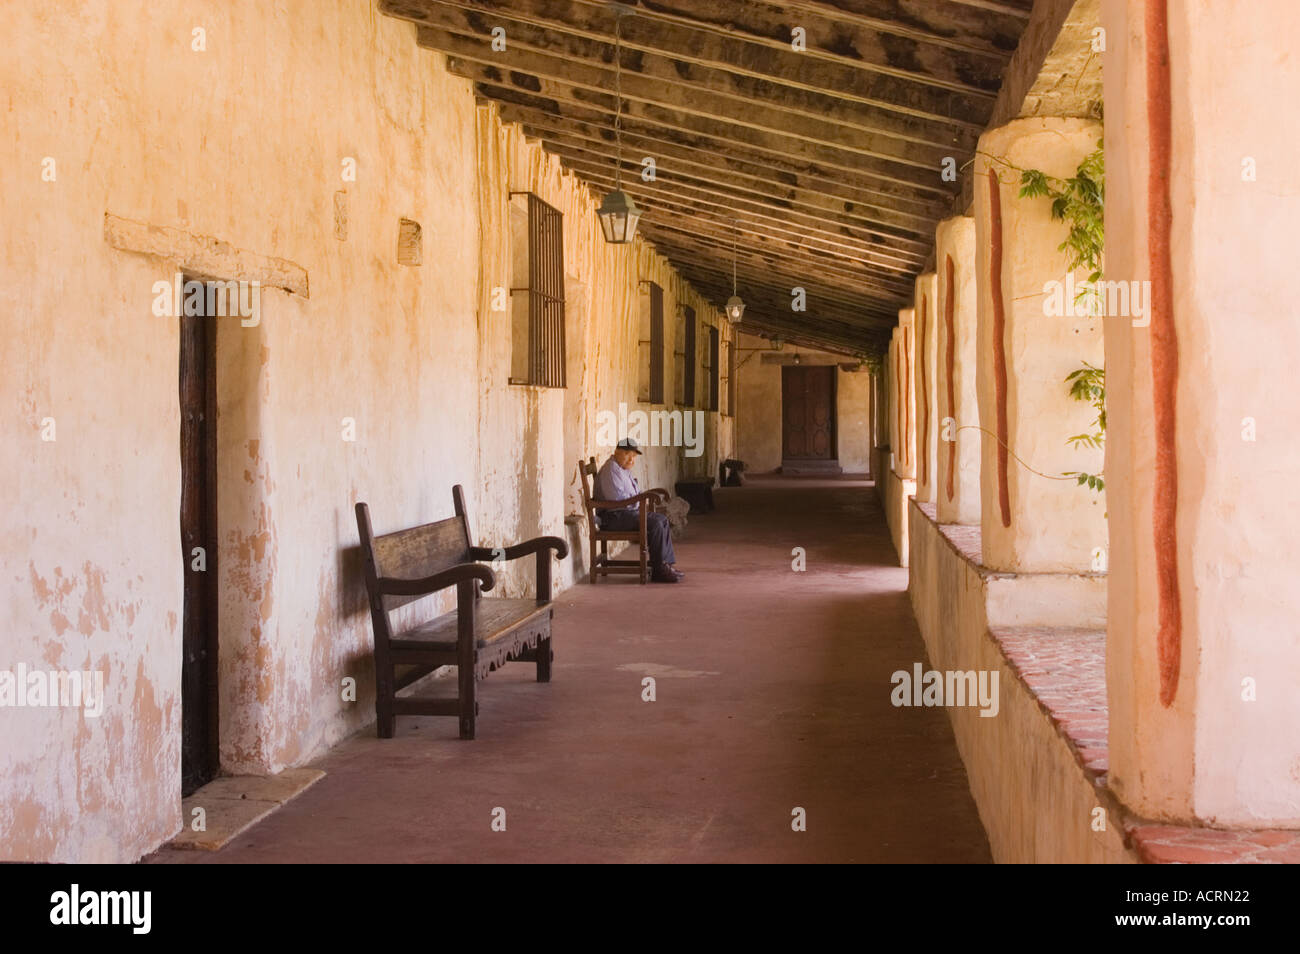 Wonderful Patio Hallway At Mission San Carlos Borromeo Del Rio Carmelo Carmel  California